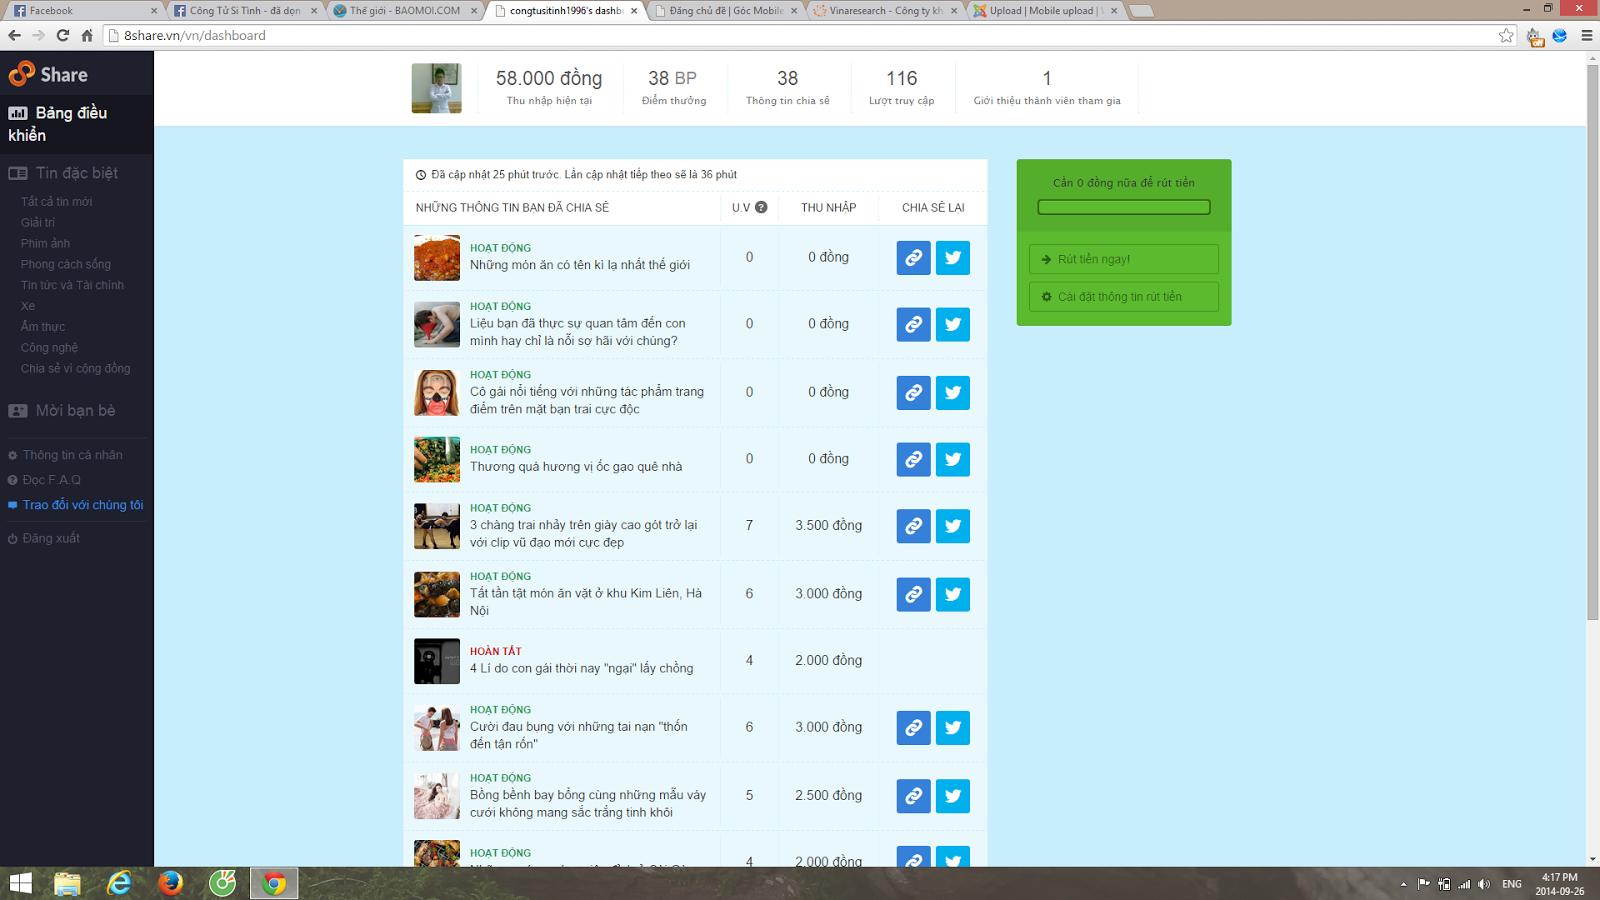 Screenshot-2014-09-26-16.17.13.png